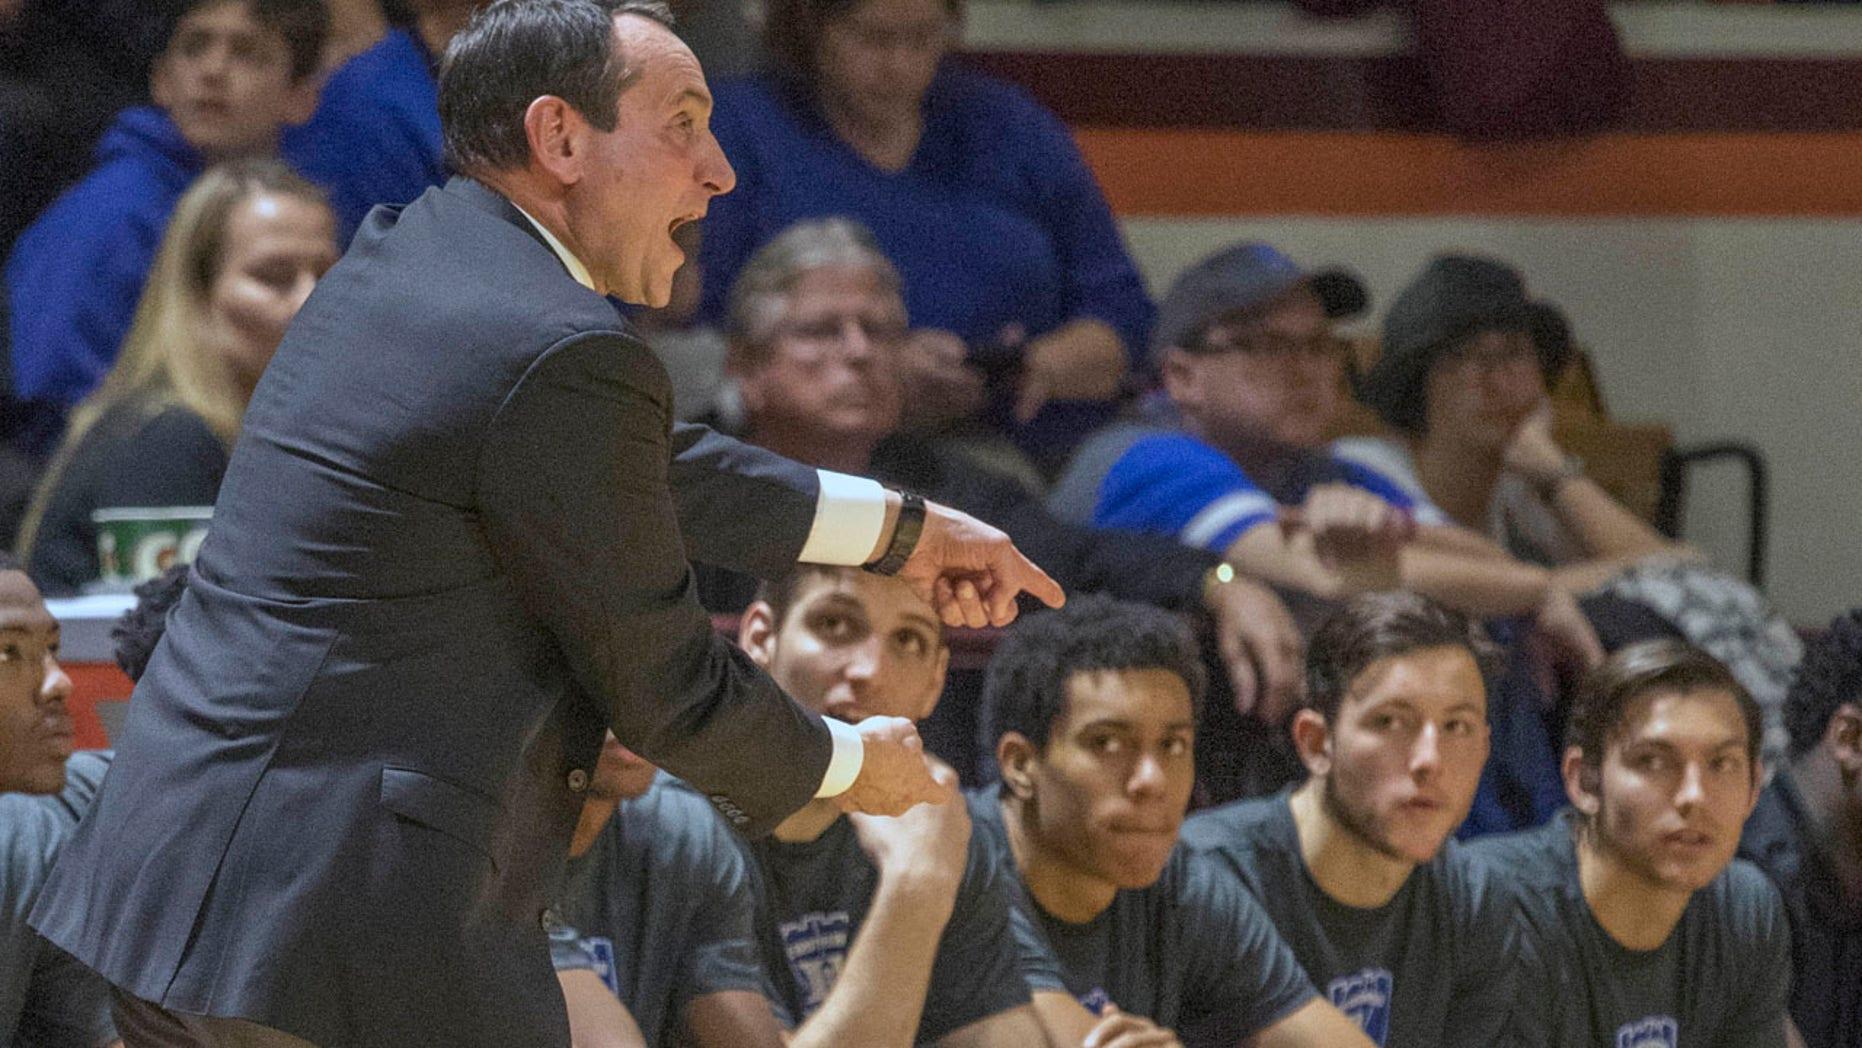 Dec. 31, 2016: Duke head coach Mike Krzyzewski yells to his players during the first half of their game against Virginia Tech in Blacksburg, Va. Virginia Tech won 89-75